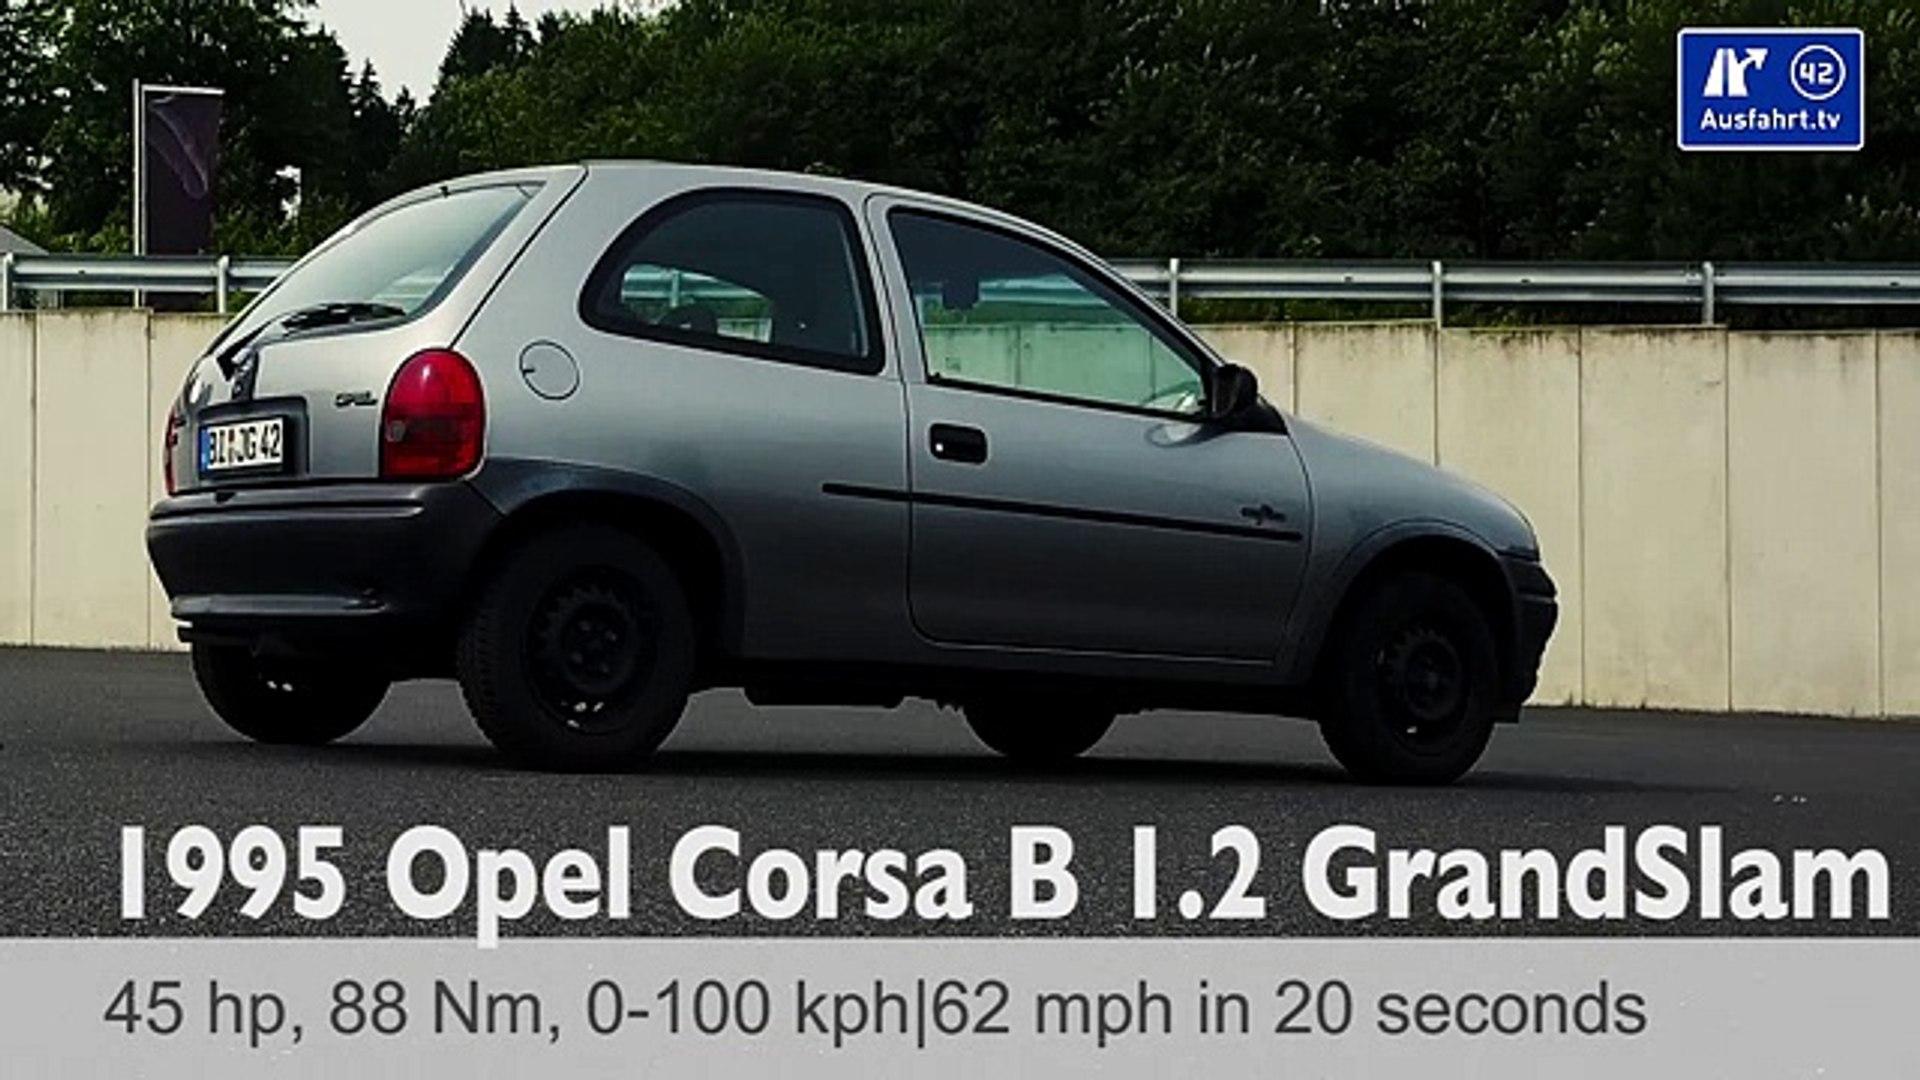 100 Kph To Mph >> 1995 Opel Corsa B 1 2 45 Ps Grand Slam 0 100 Kmh Kph 0 60 Mph Tachovideo Beschleunigung Acceleration